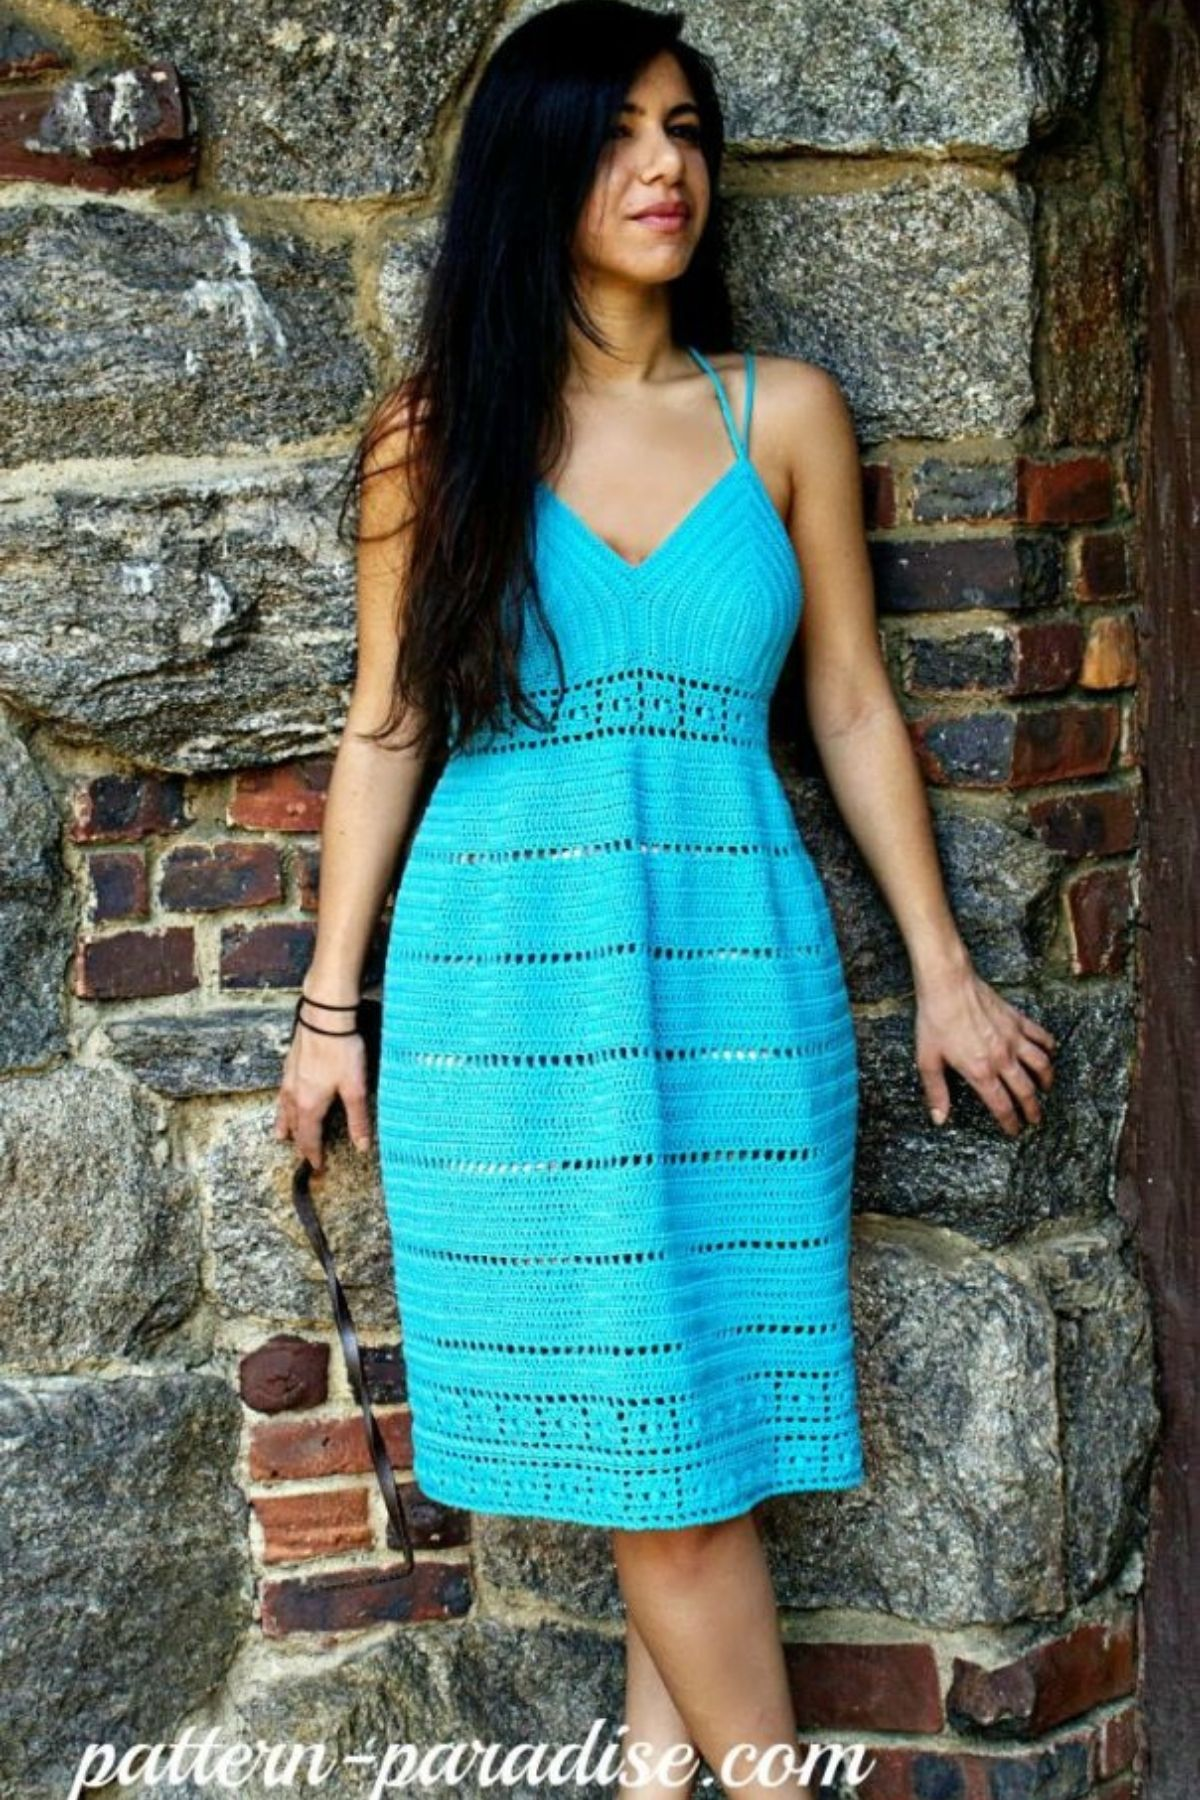 Brunette in teal dress against brick wall